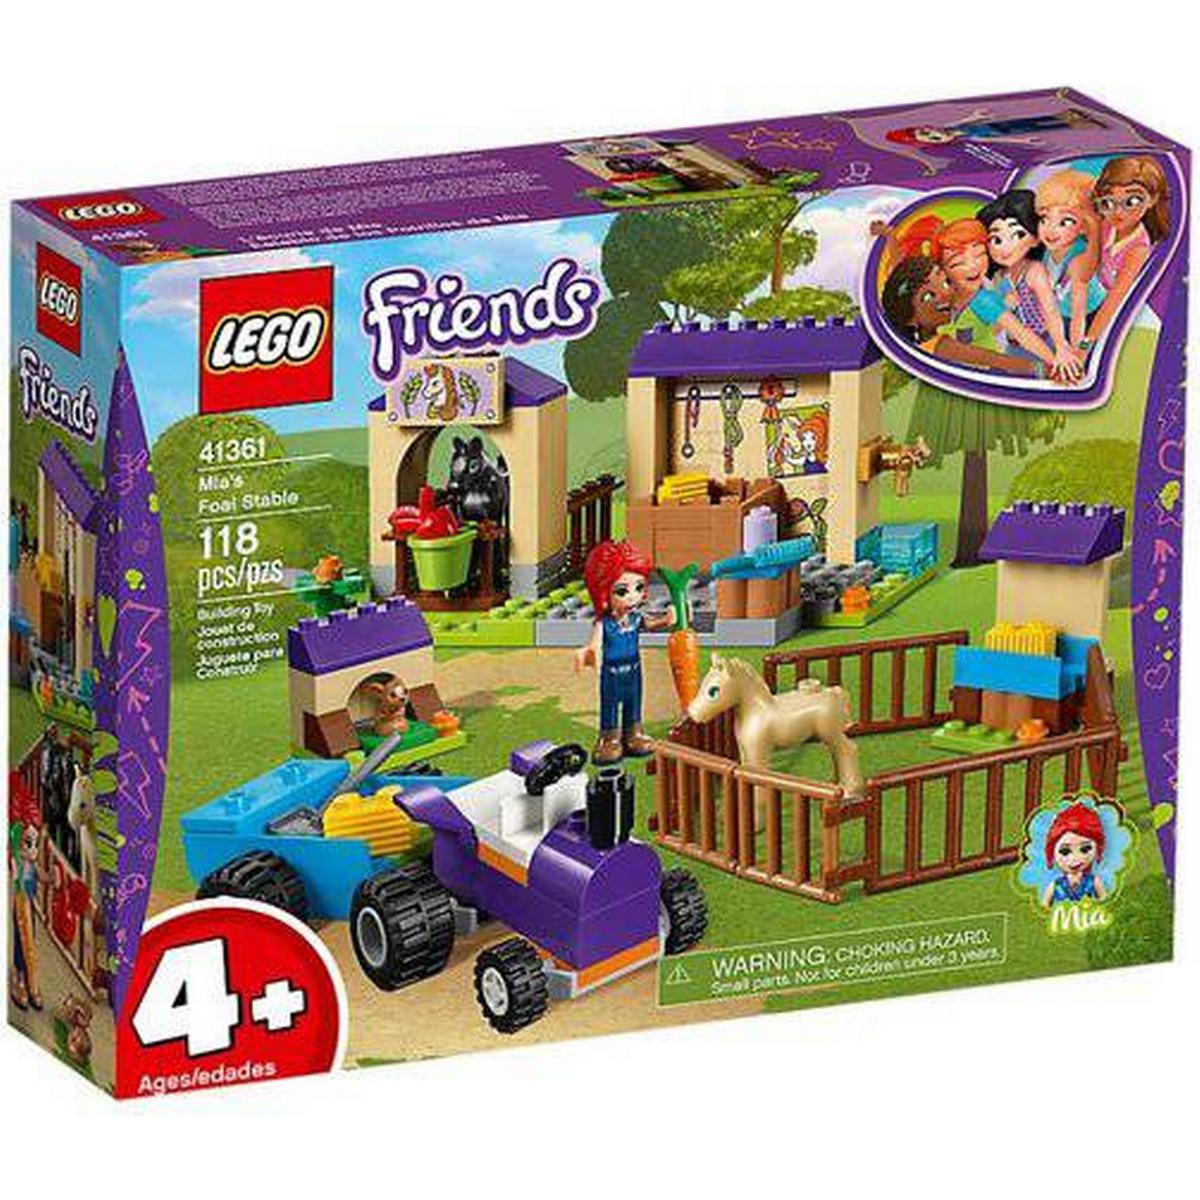 dbdd9b9a975 Bondegård - Lego Friends - Sammenlign priser hos PriceRunner